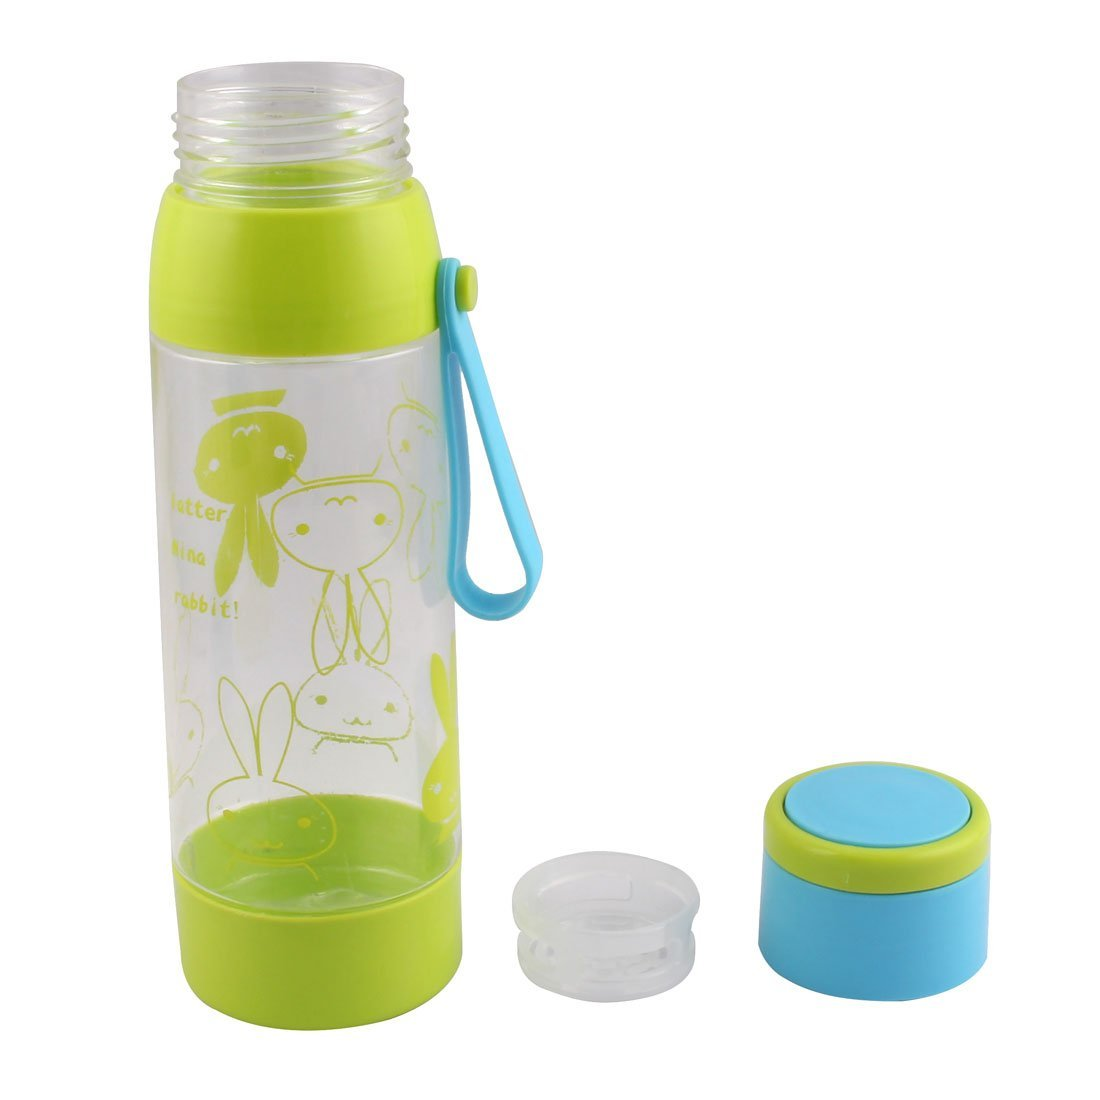 Amazon.com : eDealMax plástico Conejo Imprimir colador de té al aire Libre Deporte Botella de agua de la Taza de 600 ml Verde : Sports & Outdoors